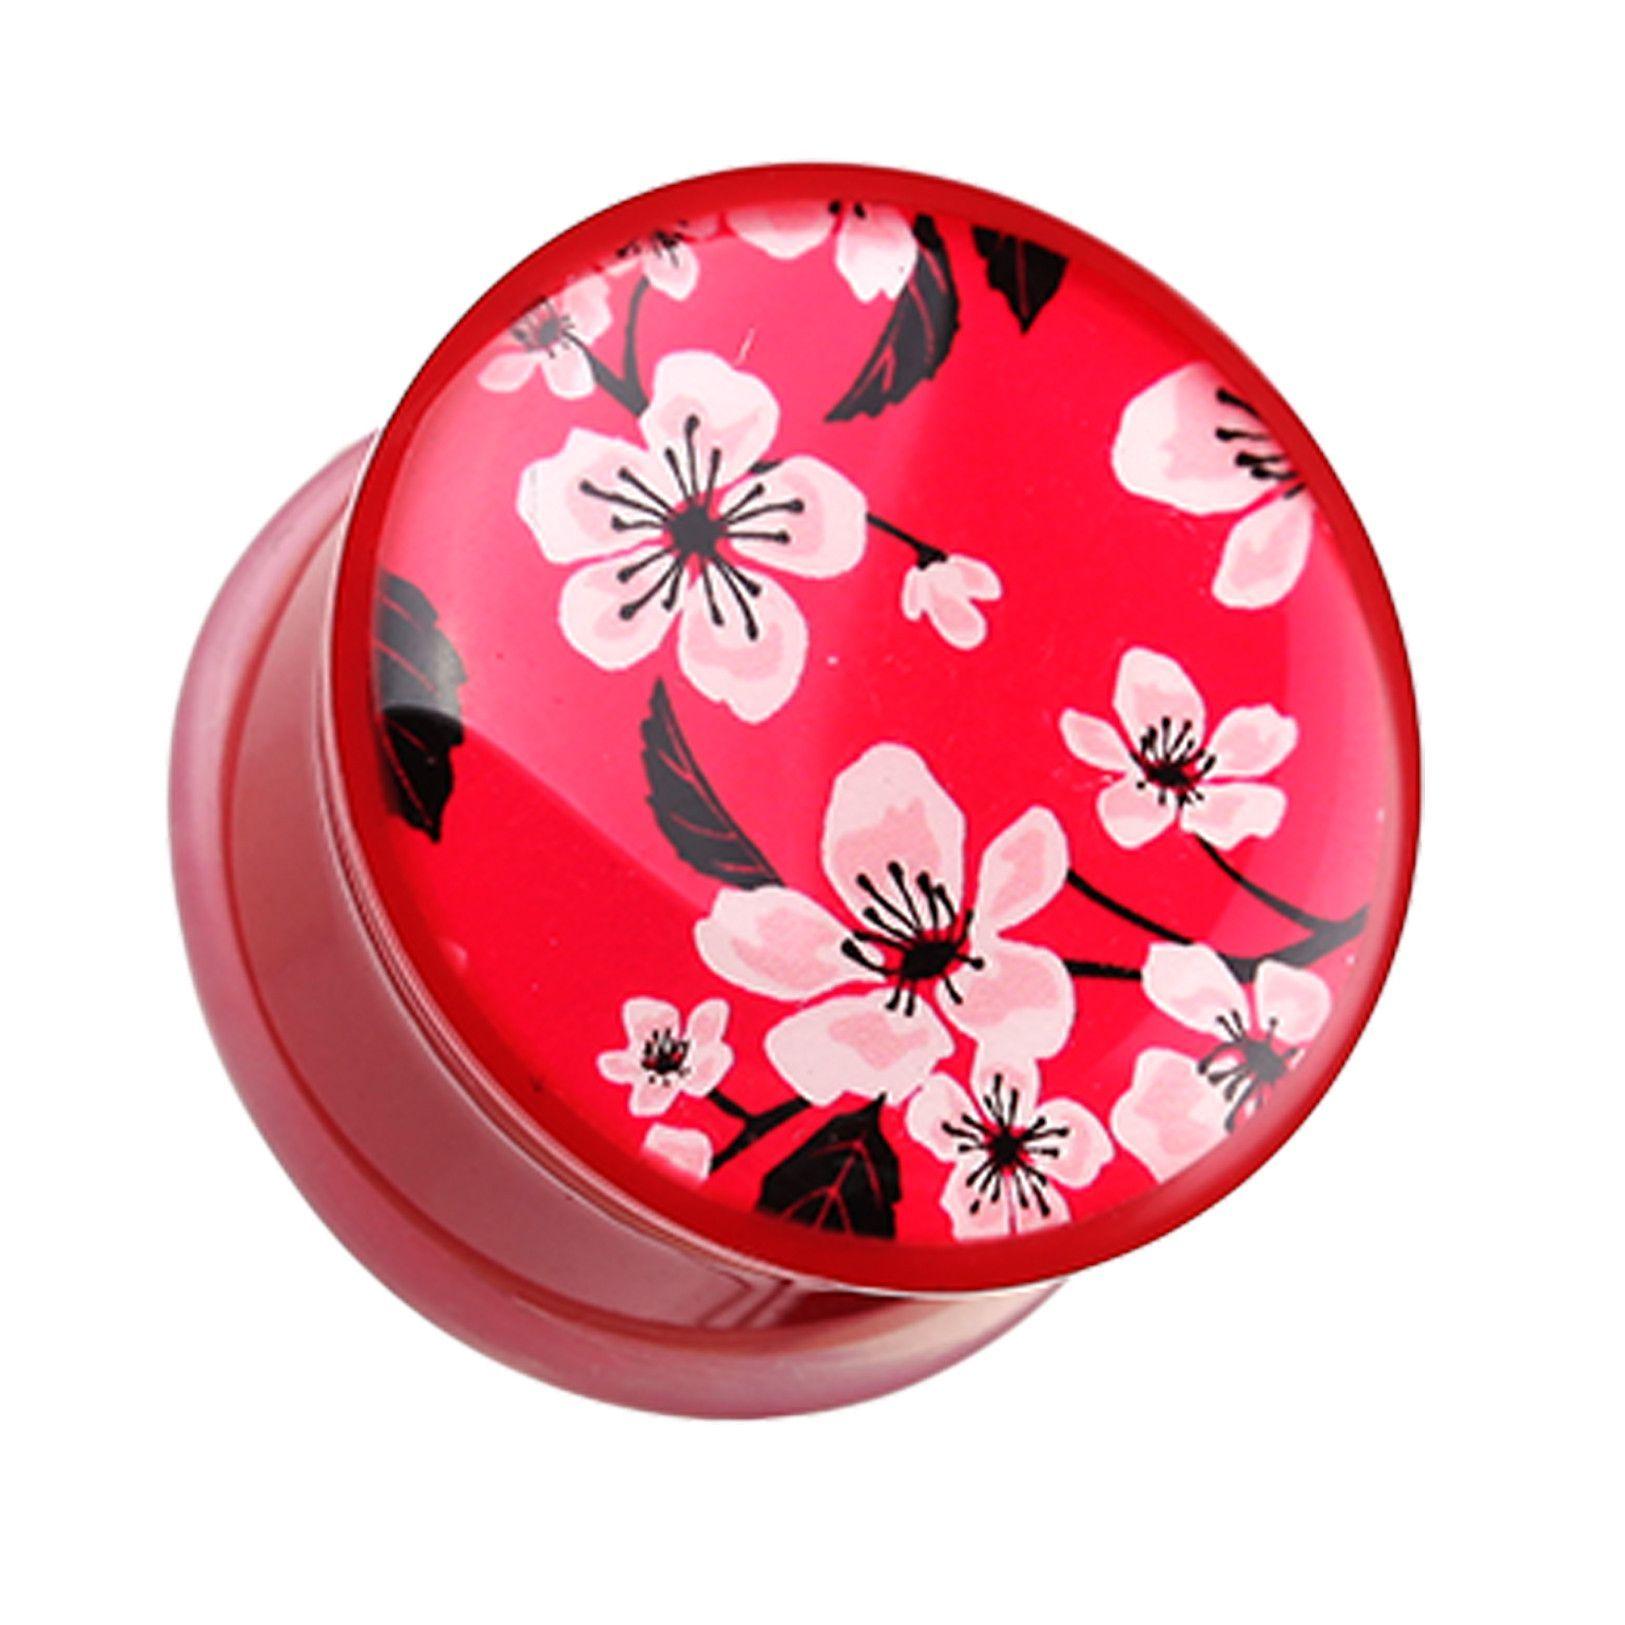 Adorable Sakura Cherry Blossom Single Flared Ear Gauge Plug Sold as a Pair